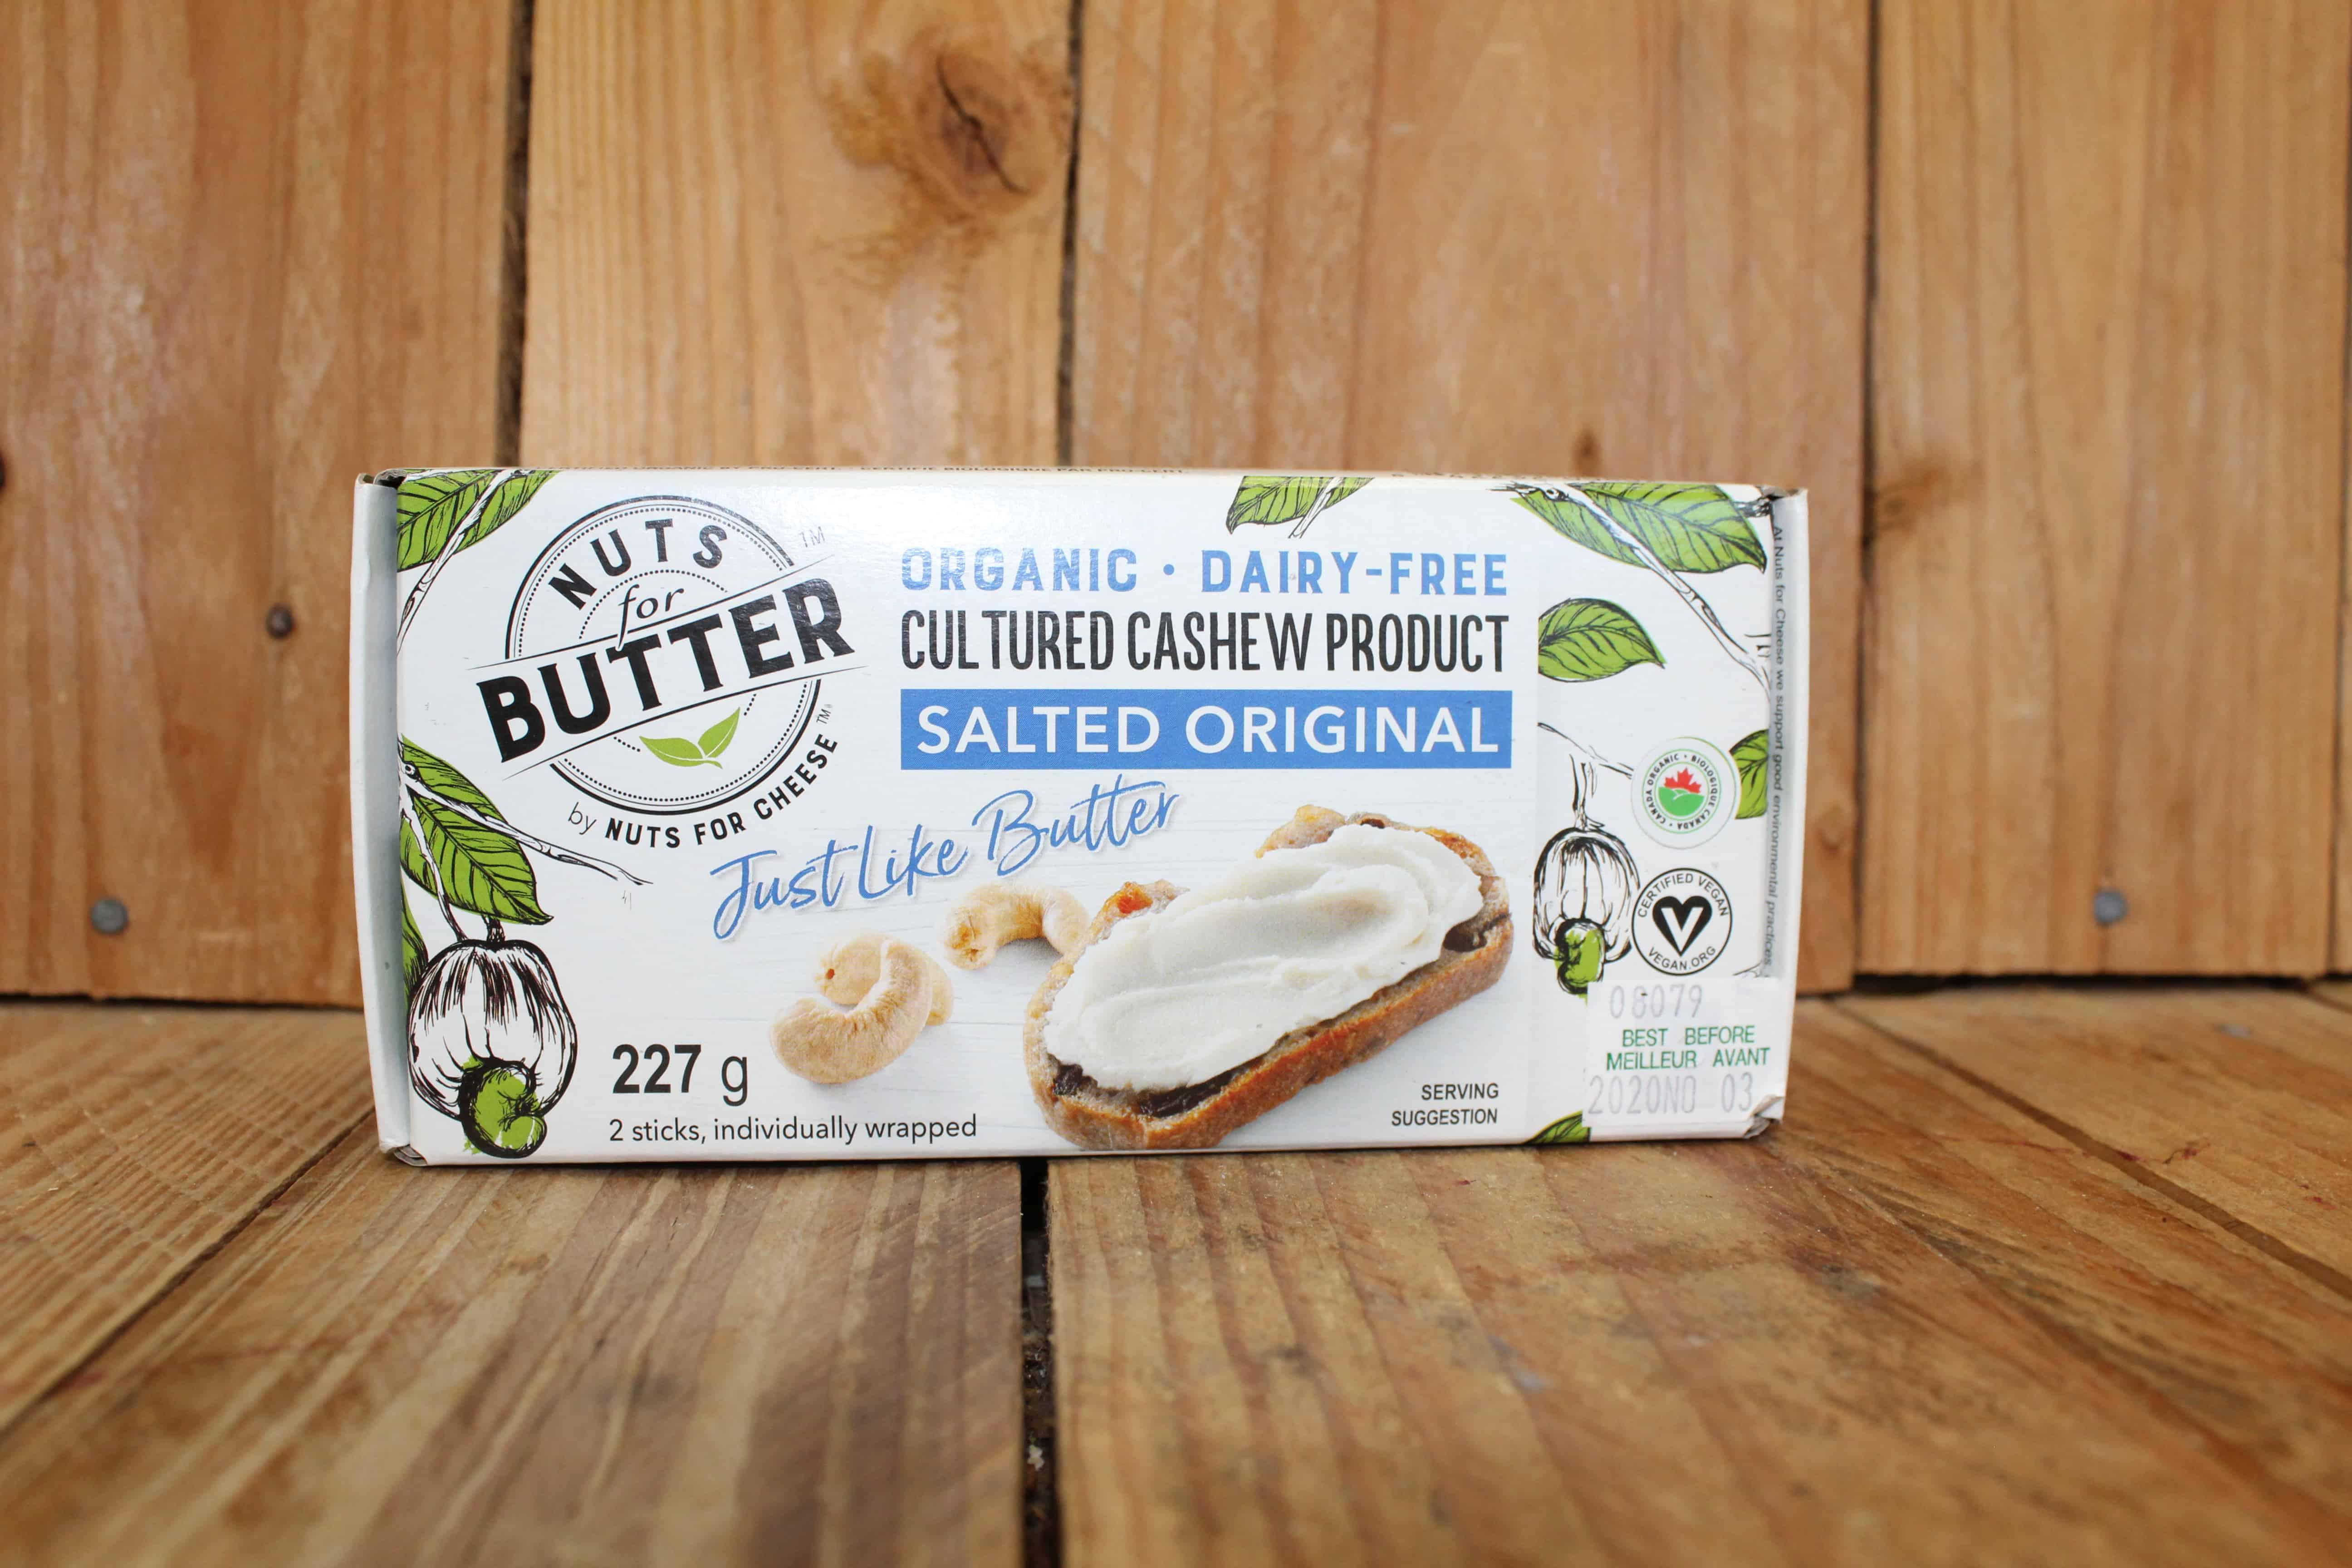 Nuts for Butter – Vegan Butter – Salted Original (227g)